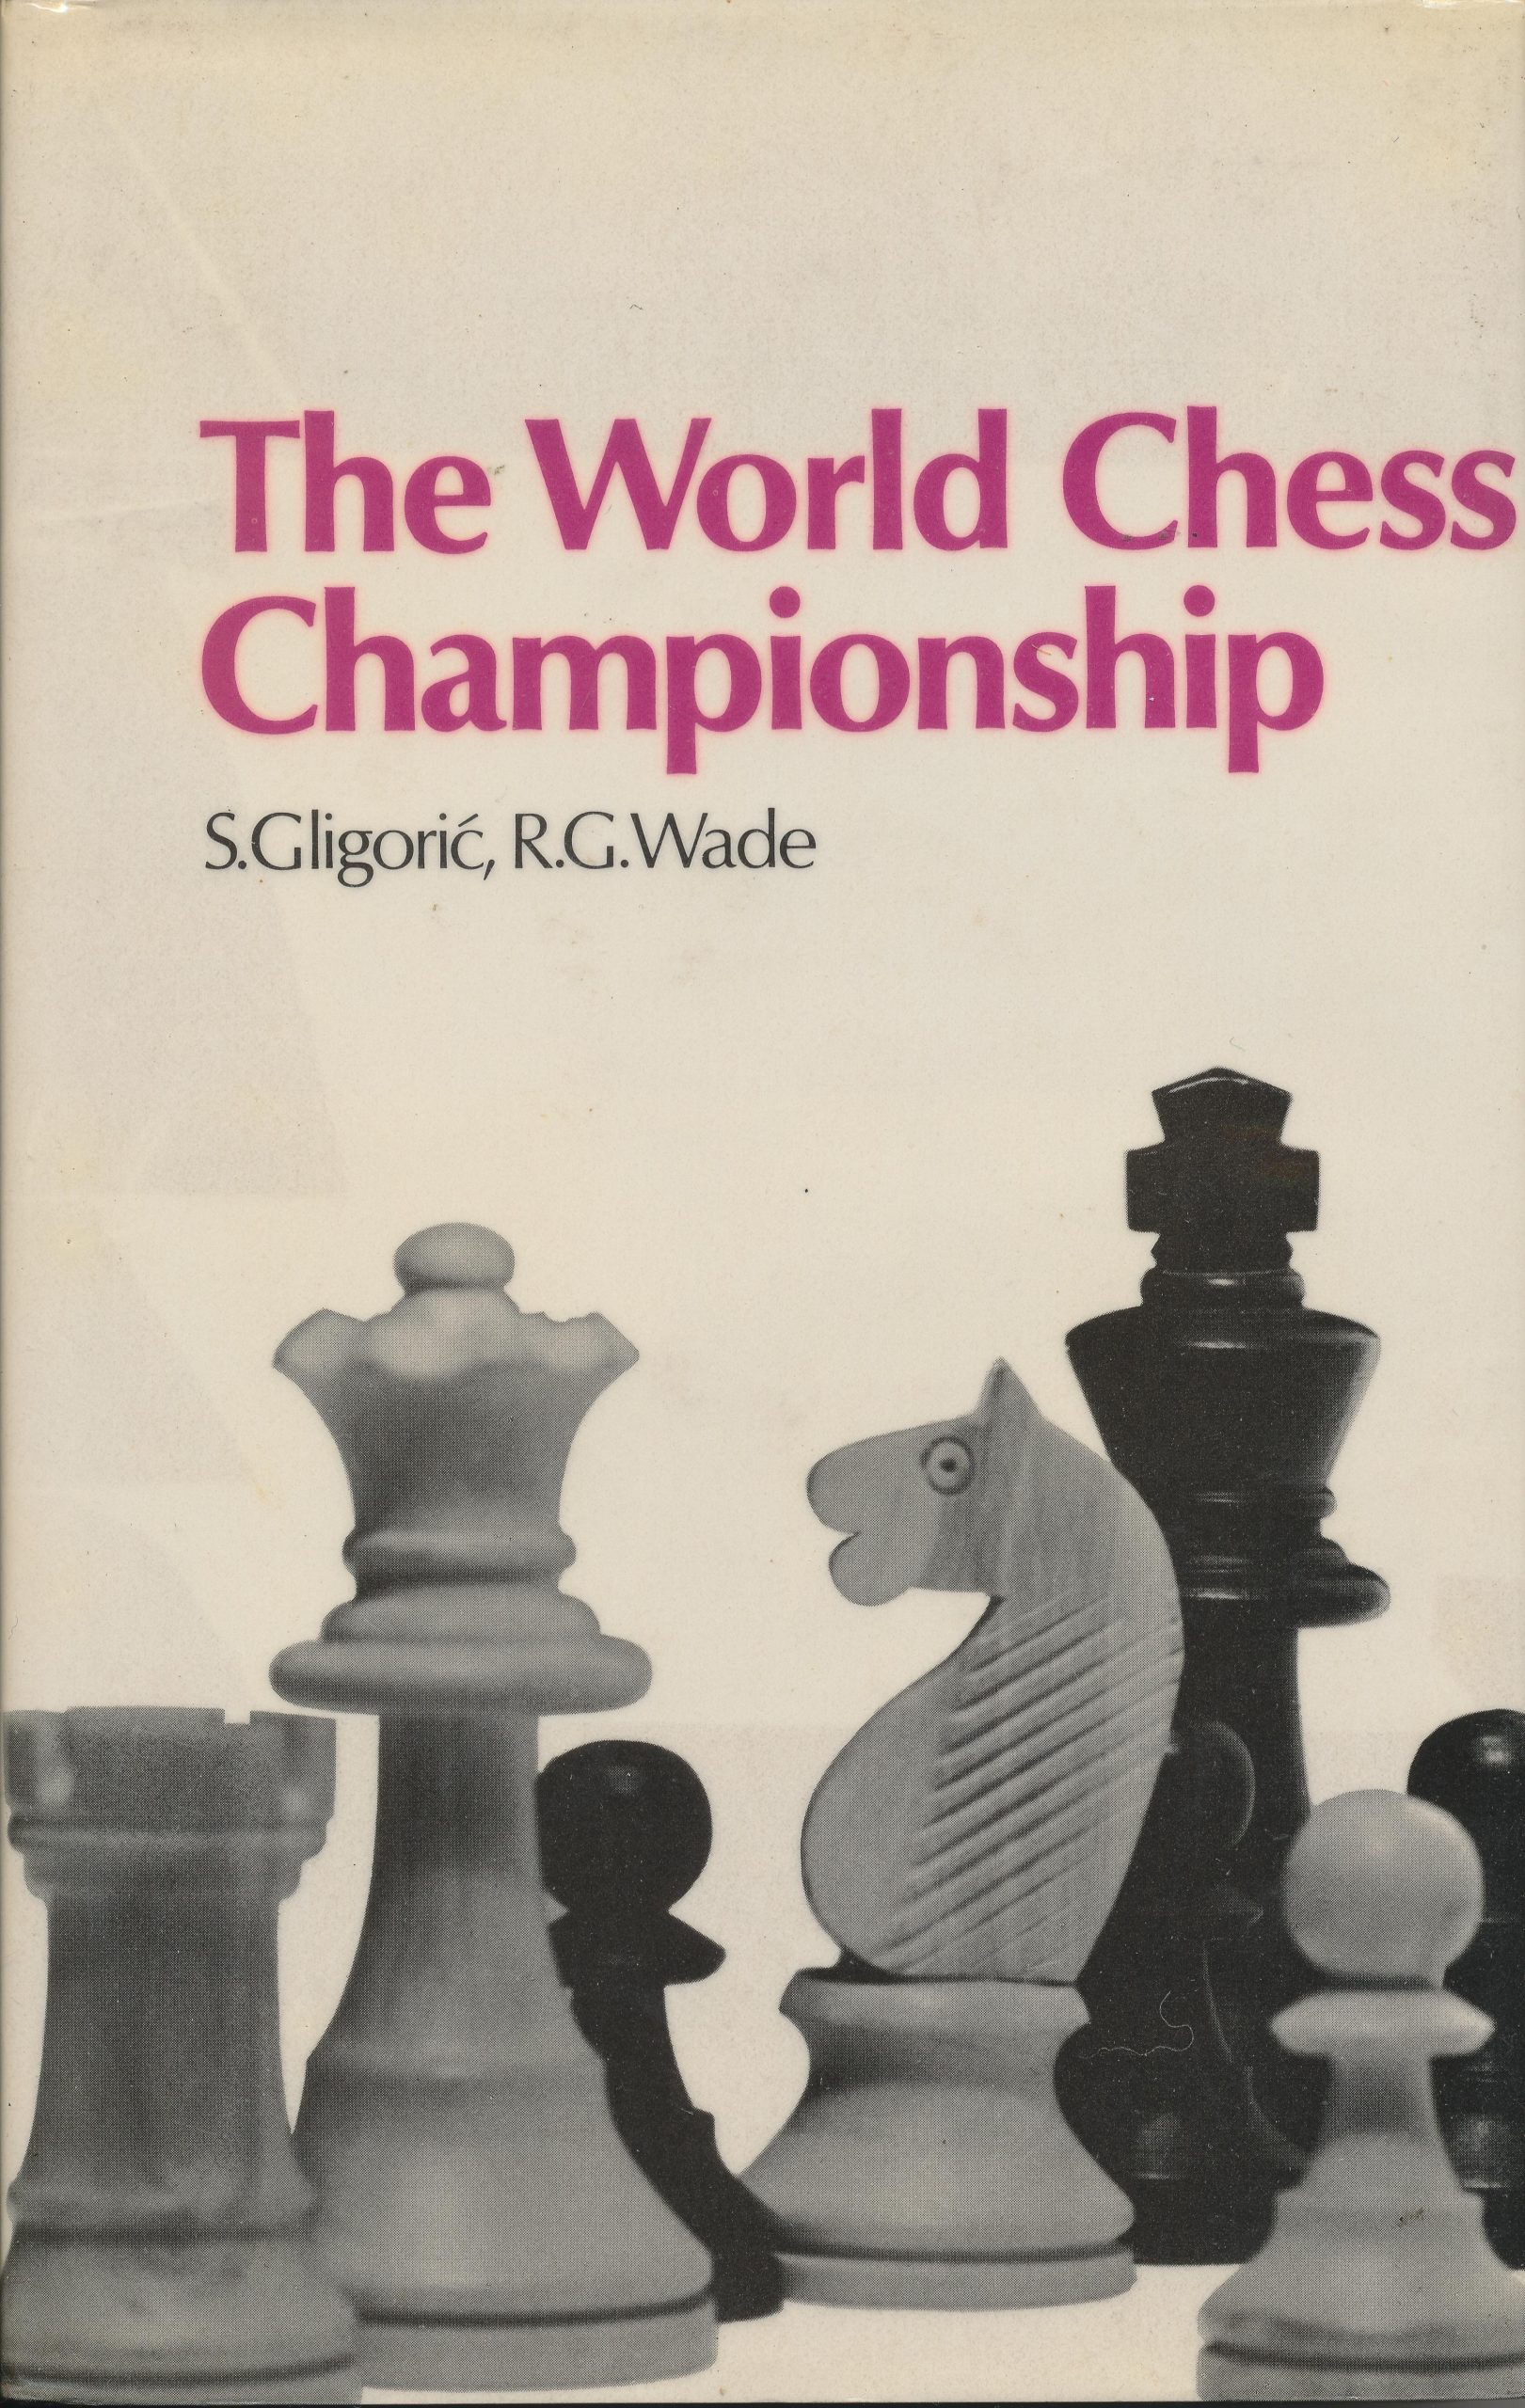 The World Chess Championship, Gligoric and Wade, Batsford, 1974